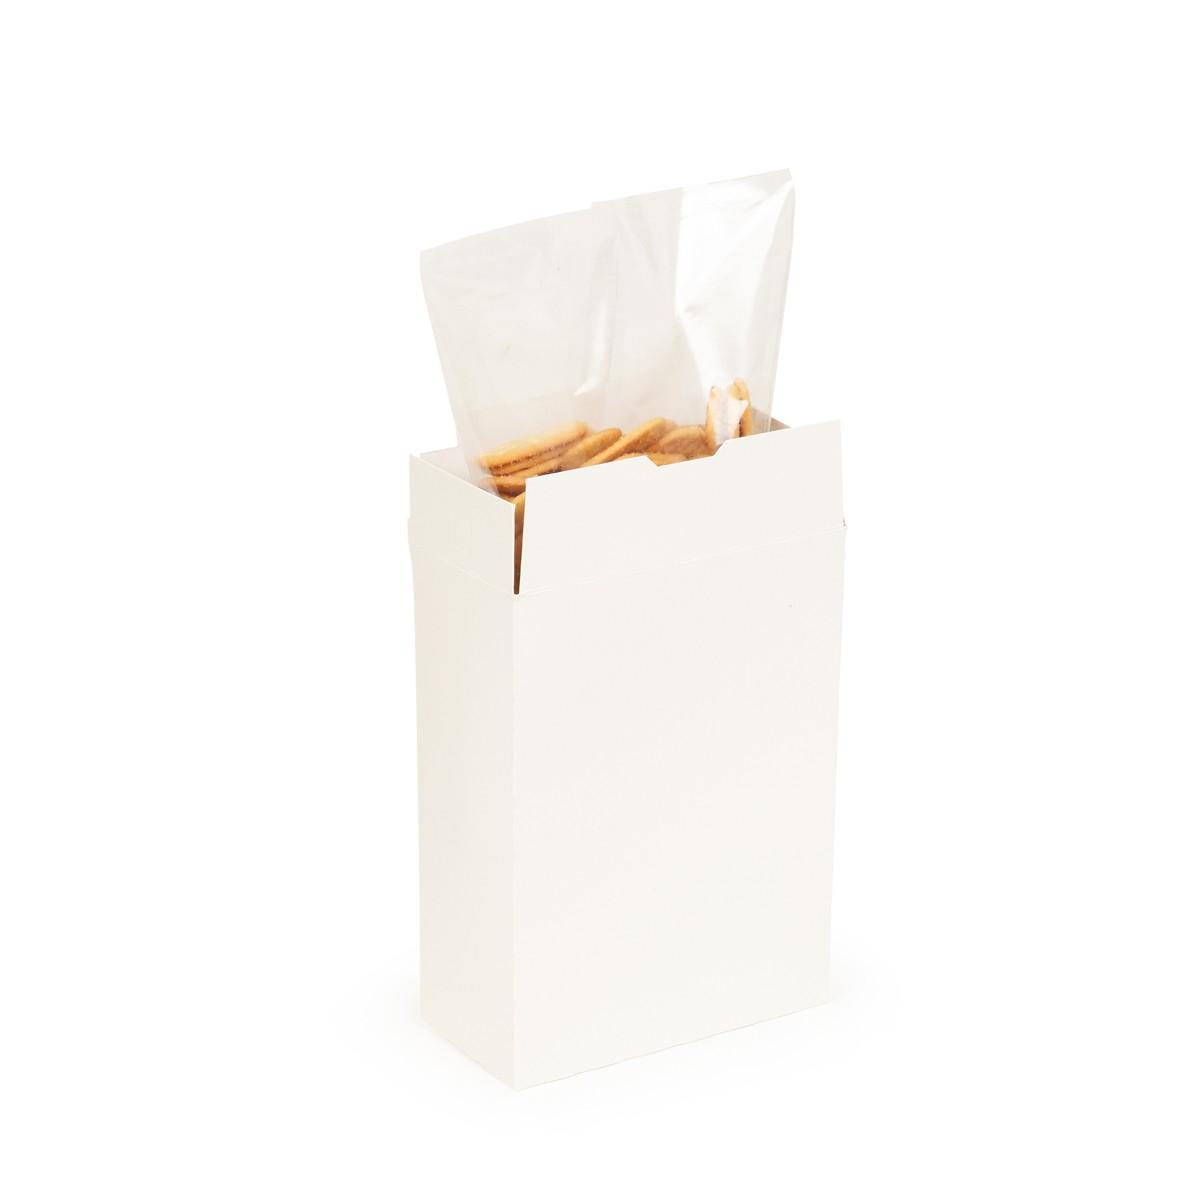 Clear bag in box